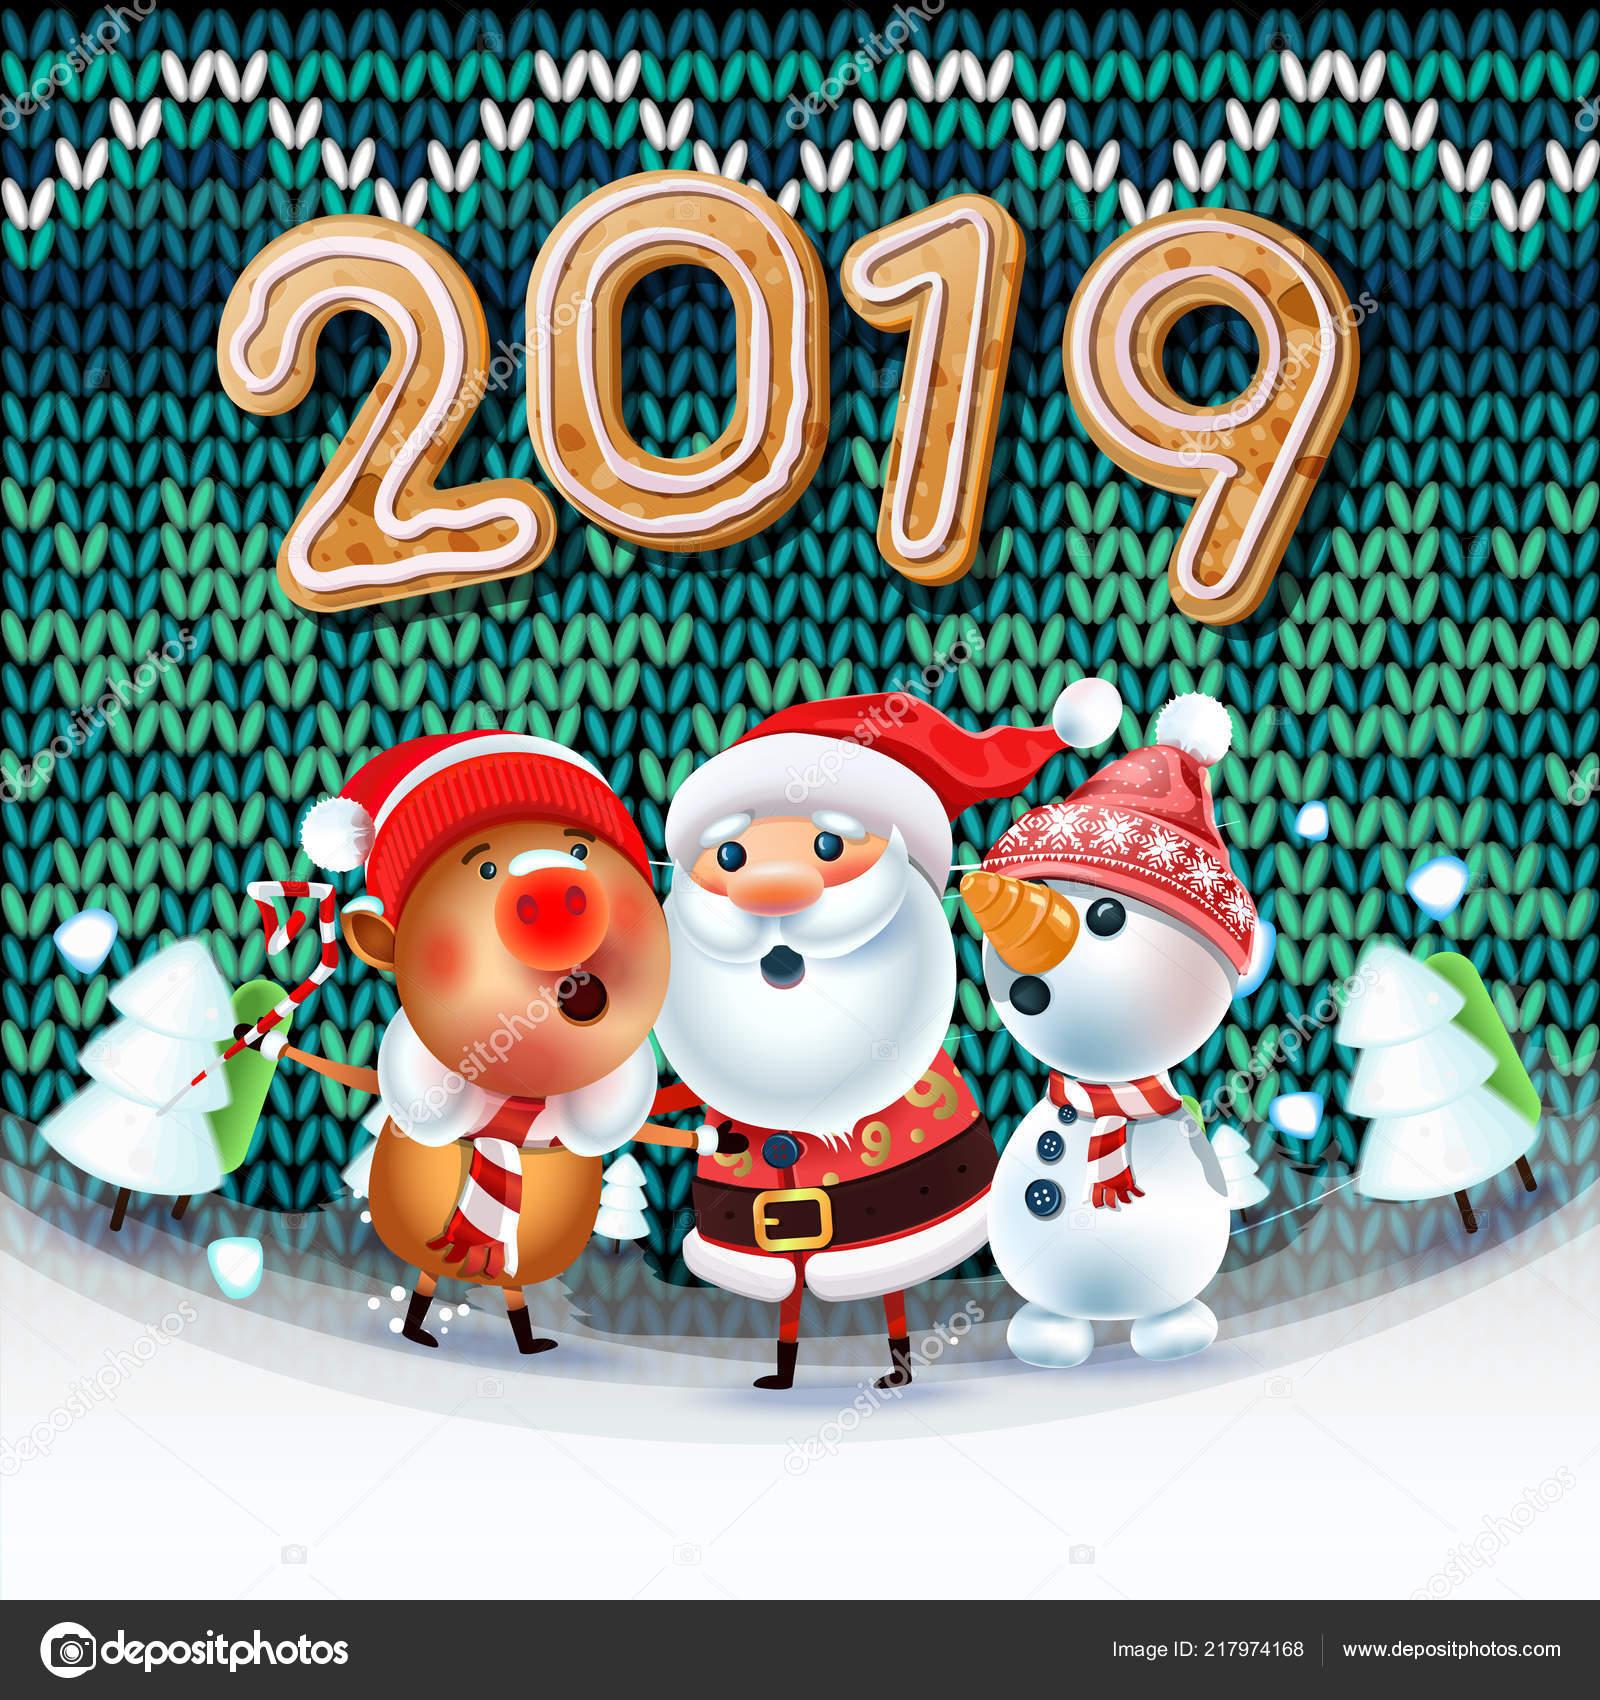 2019 St Dj Songs Dowode 4 33 Mb: 2019 Merry Christmas New Year Poster Santa Claus Snowman